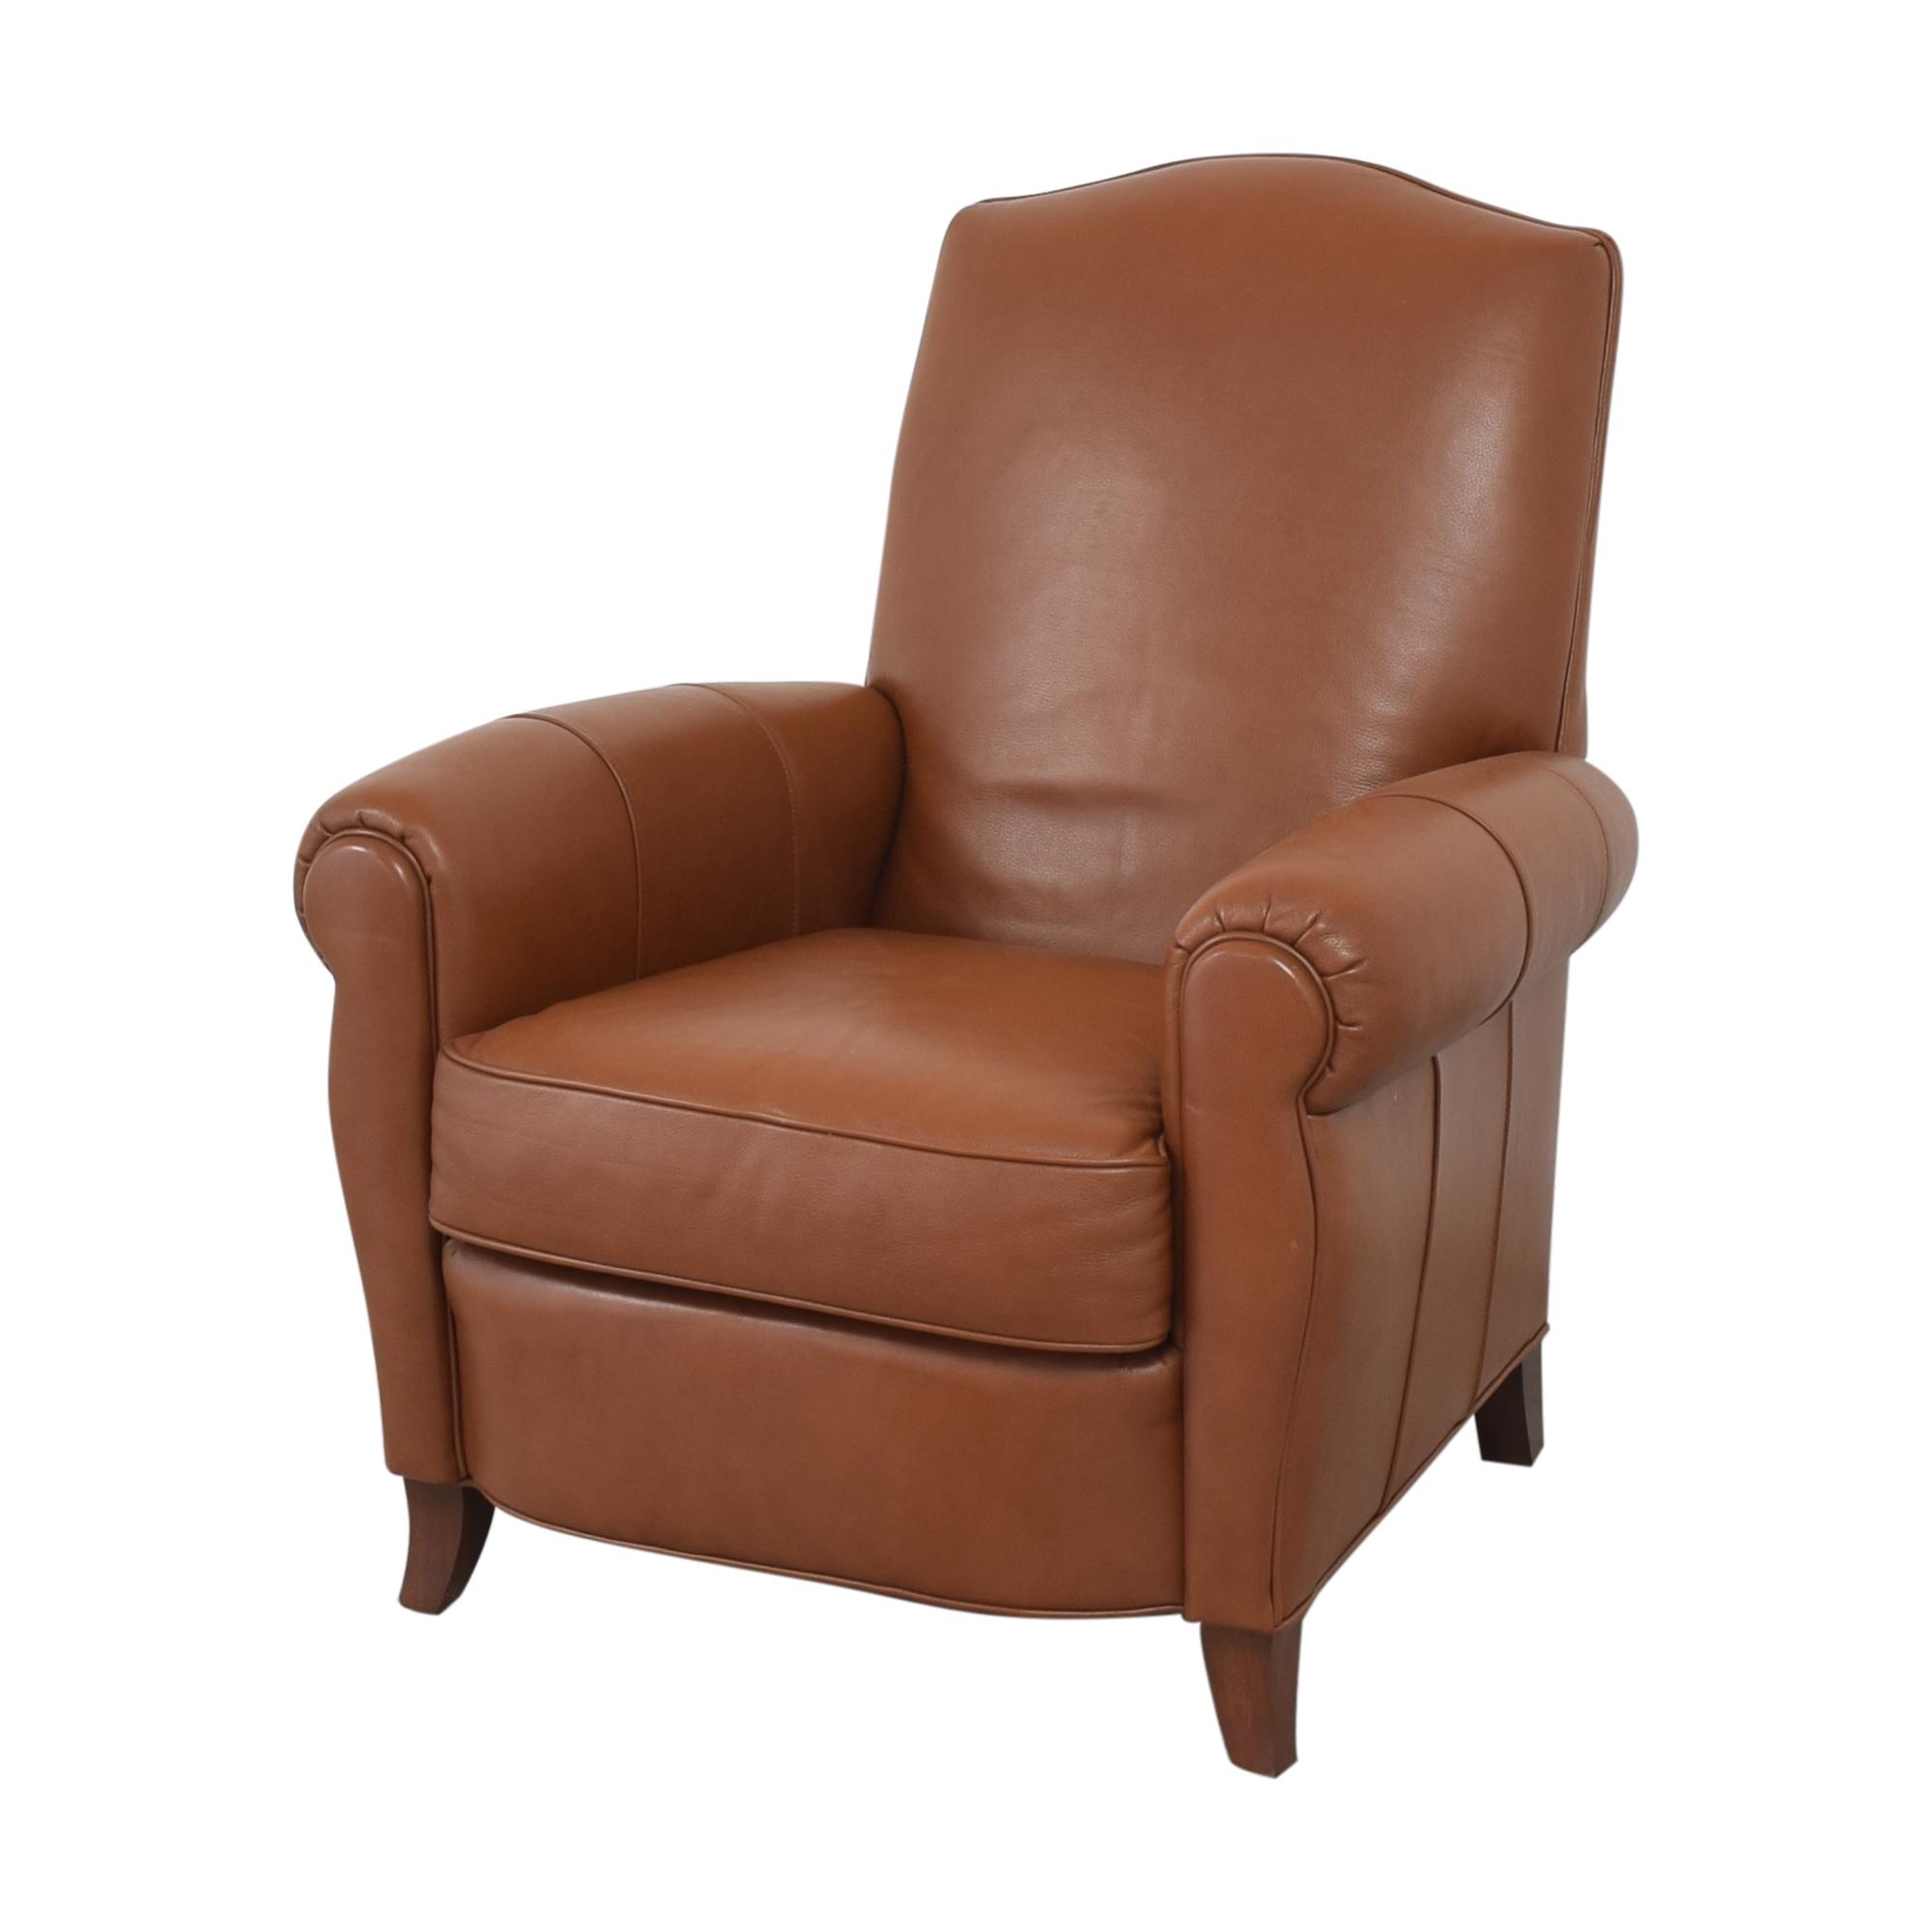 buy Ethan Allen Ethan Allen Roll Arm Chair with Ottoman online